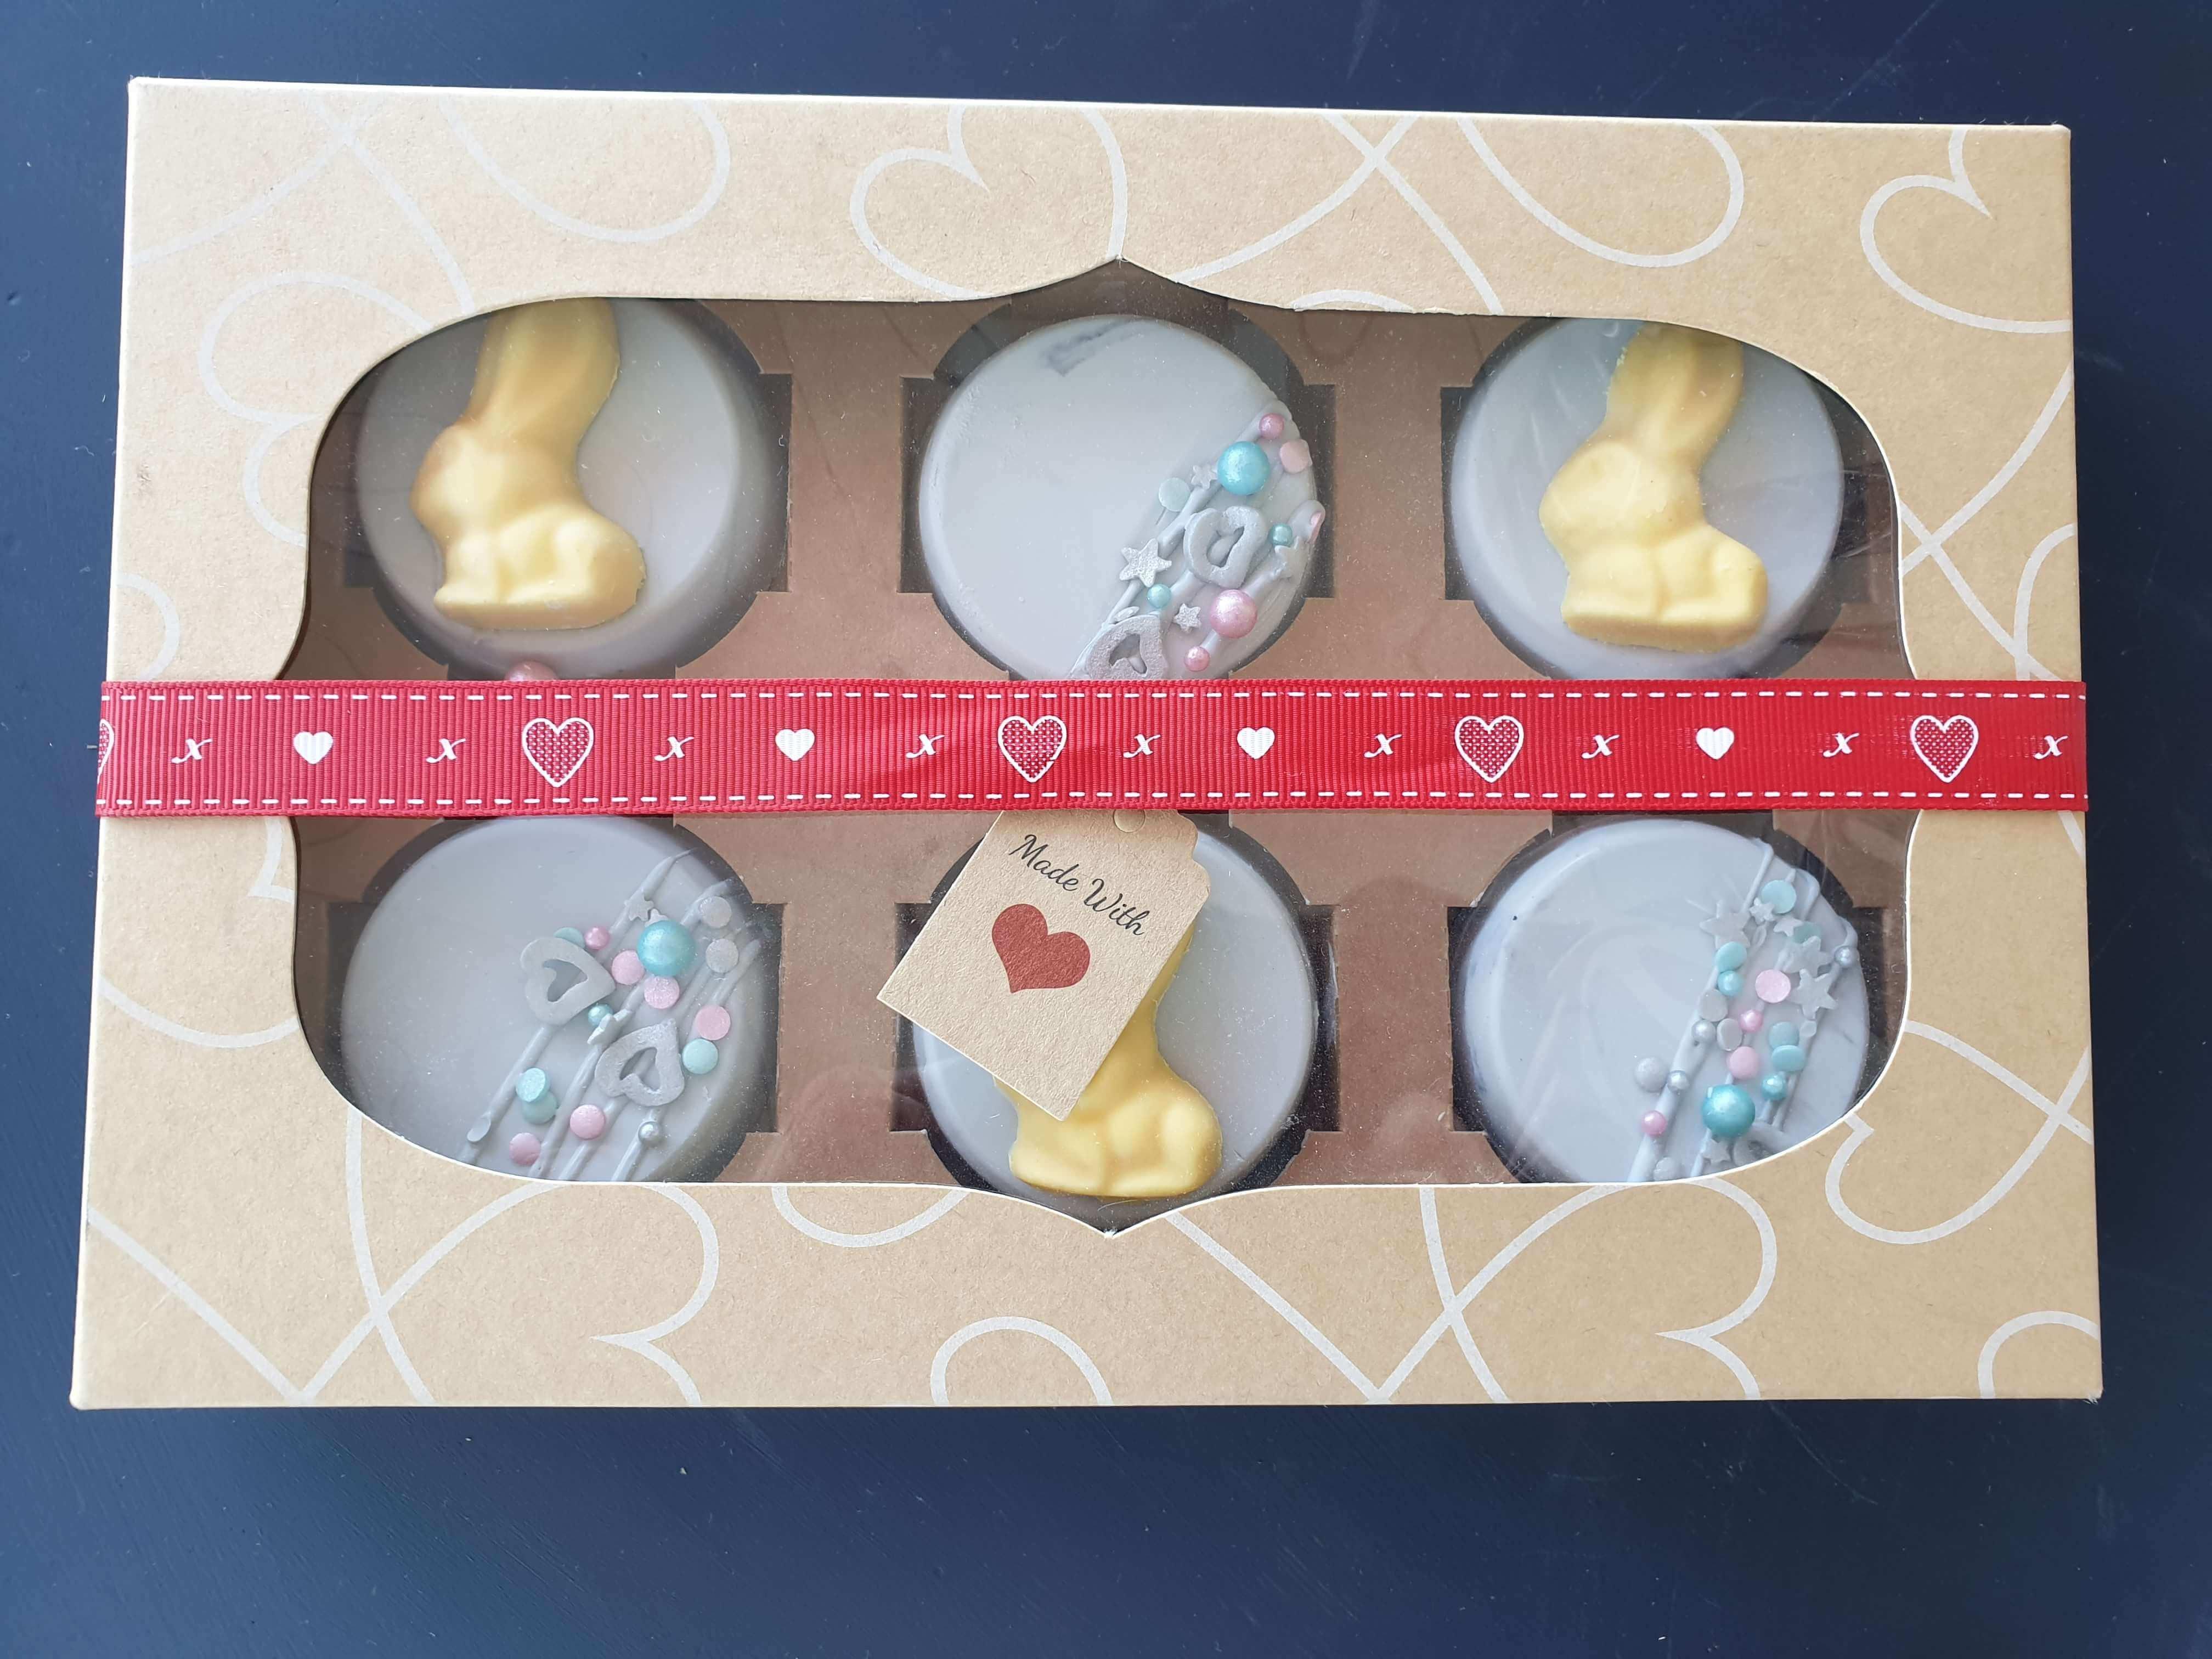 6 Pack Oreo Box with Windowed Kraft Stock Print Lid